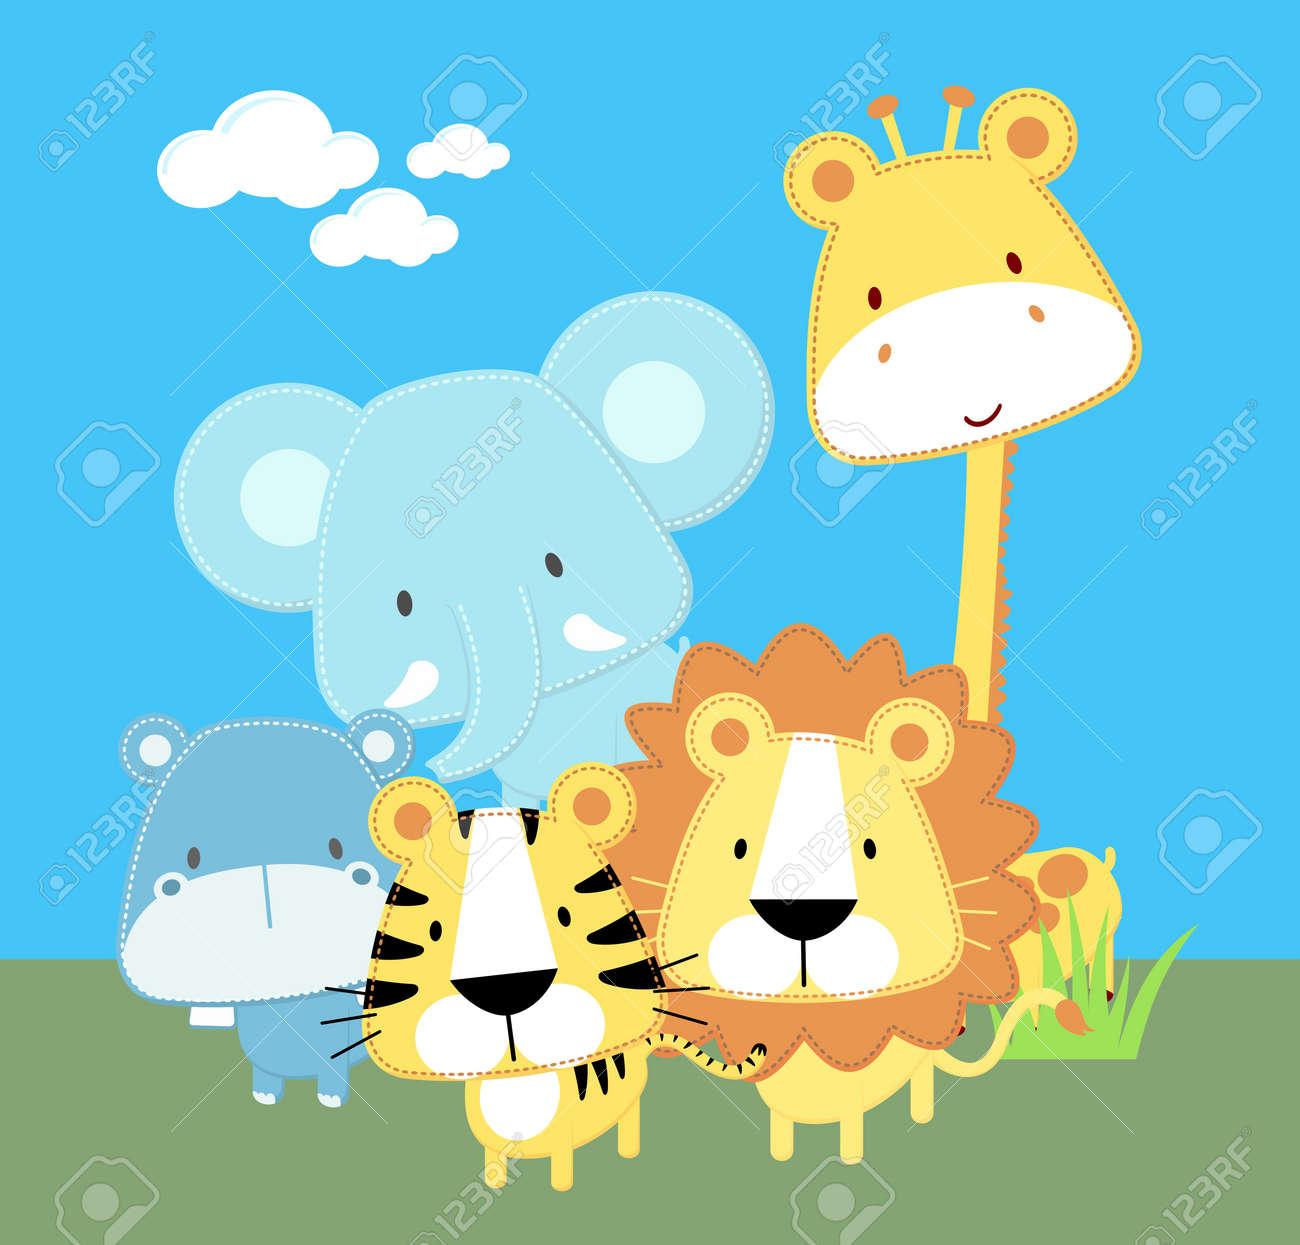 Cute safari wallpaper stock collection 12 wallpapers cute safari wallpaper stock image image 29894881 voltagebd Images